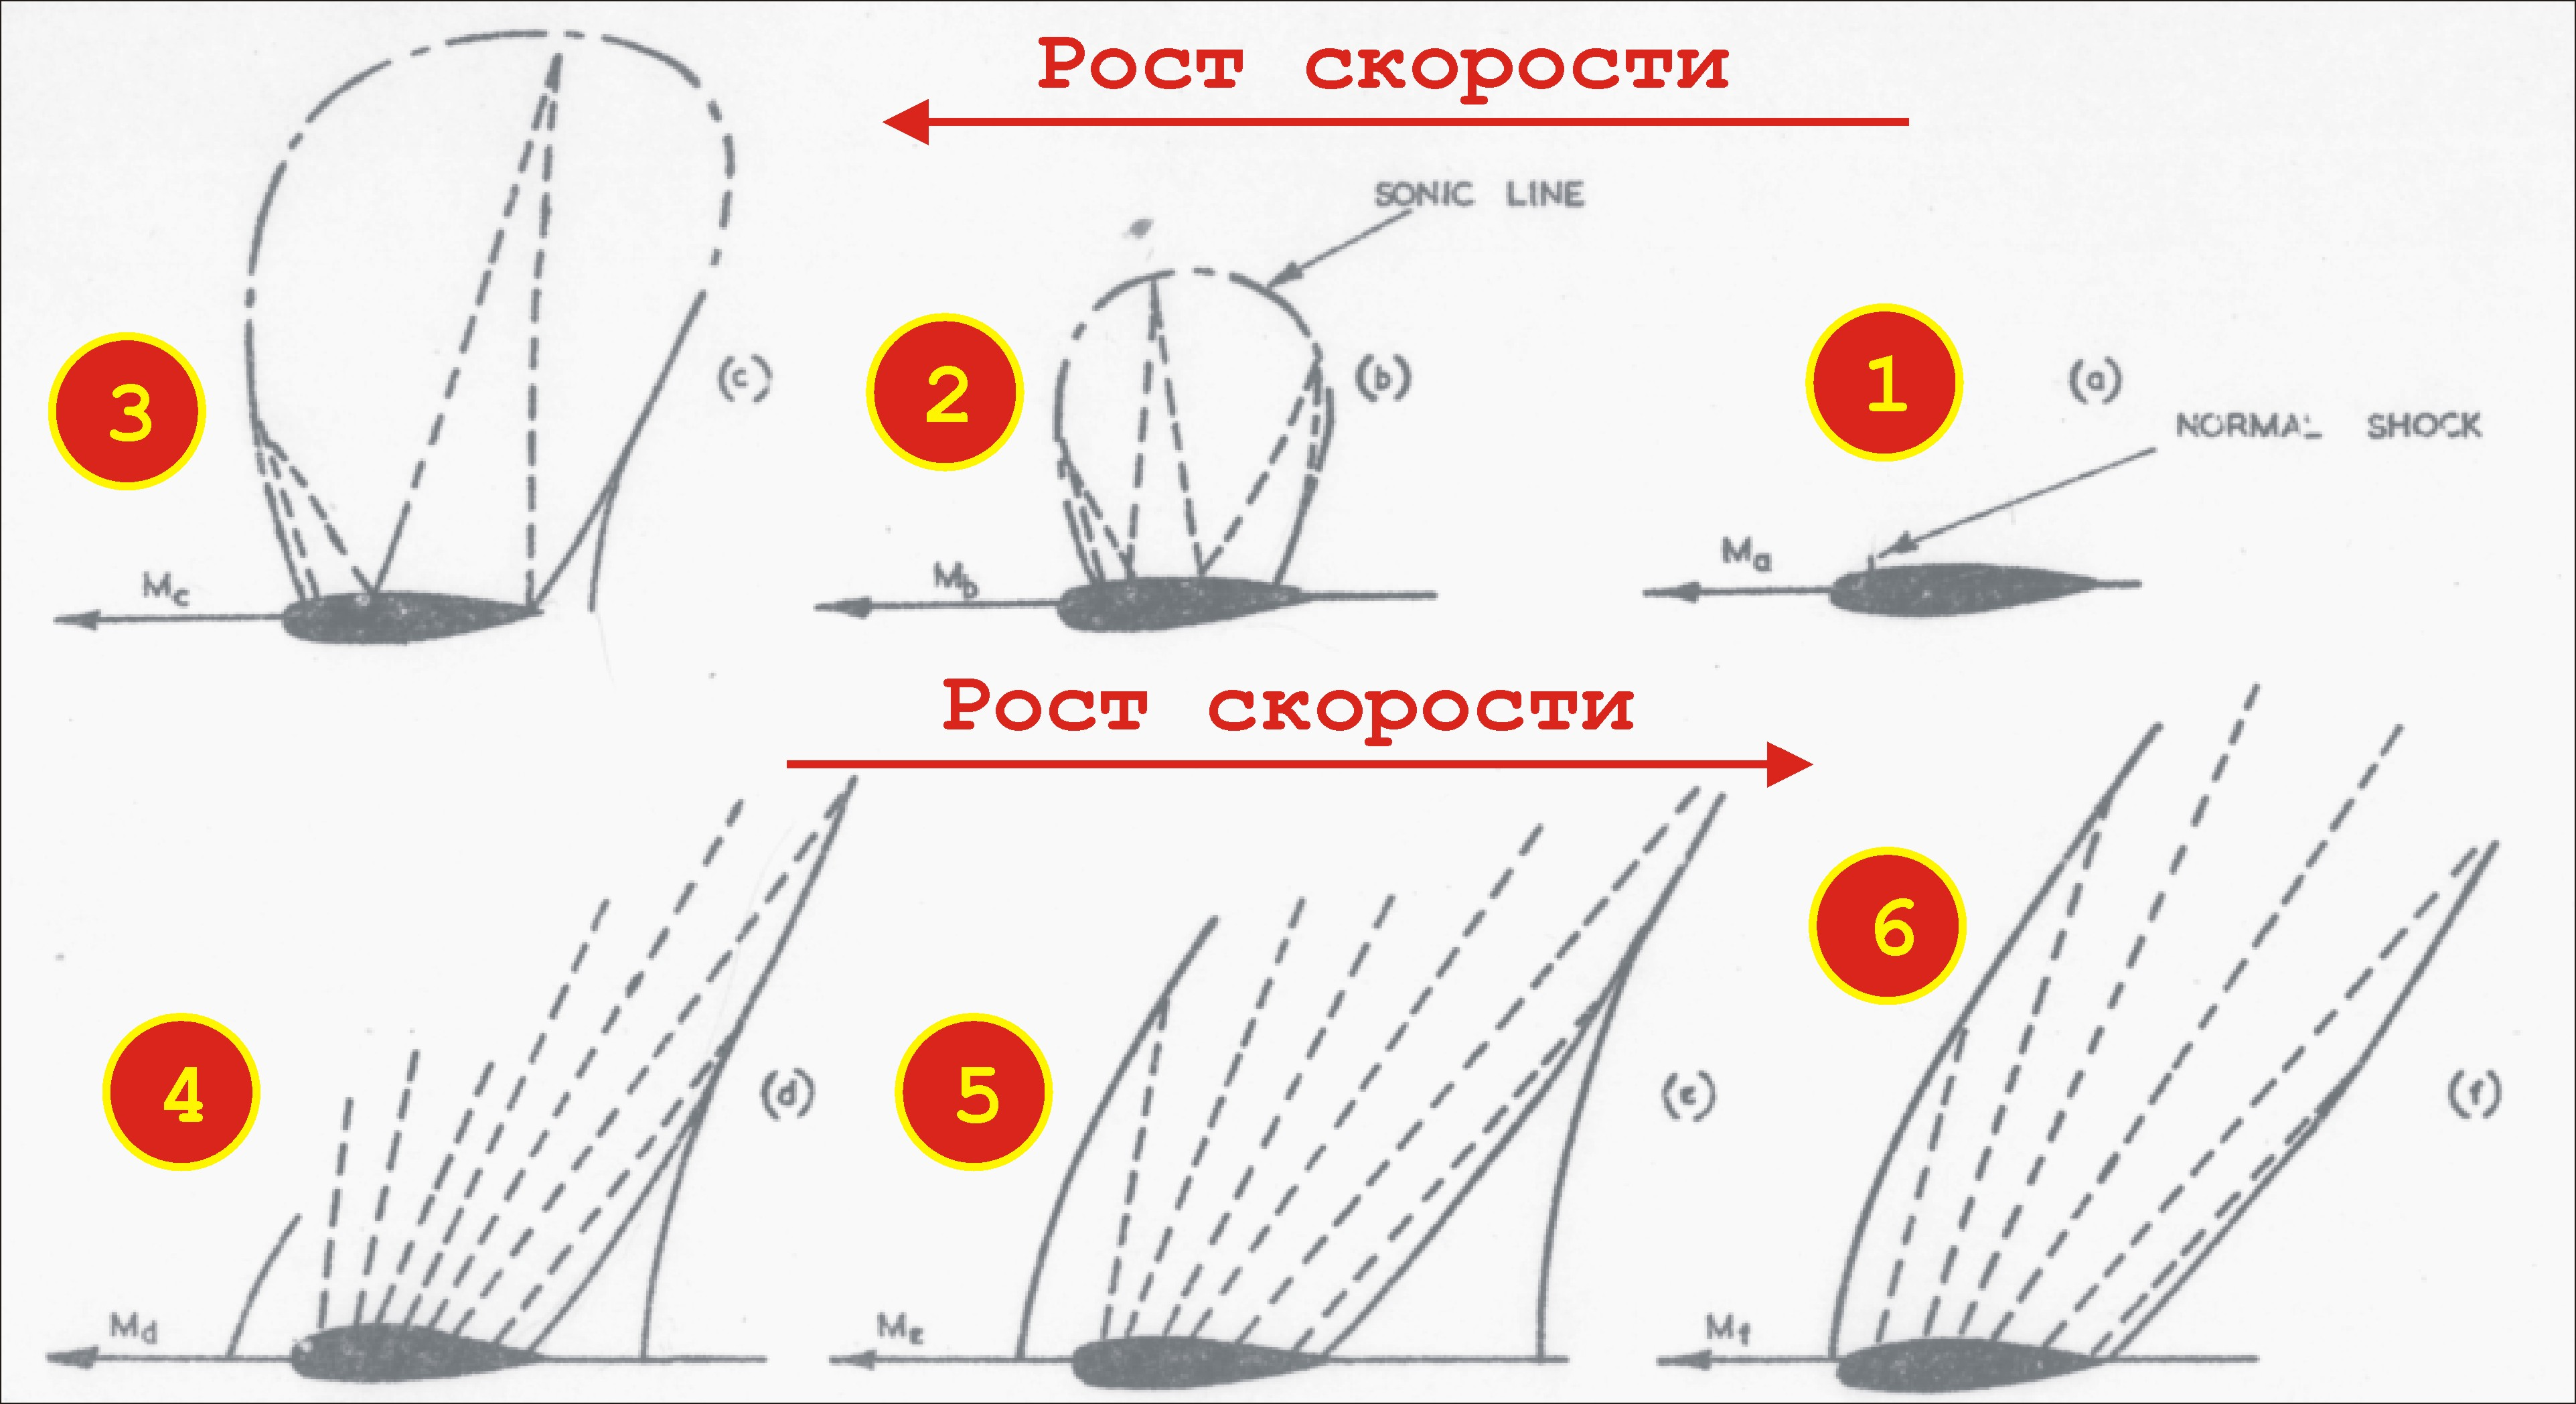 http://images.vfl.ru/ii/1552400869/aefa10a6/25737220.jpg